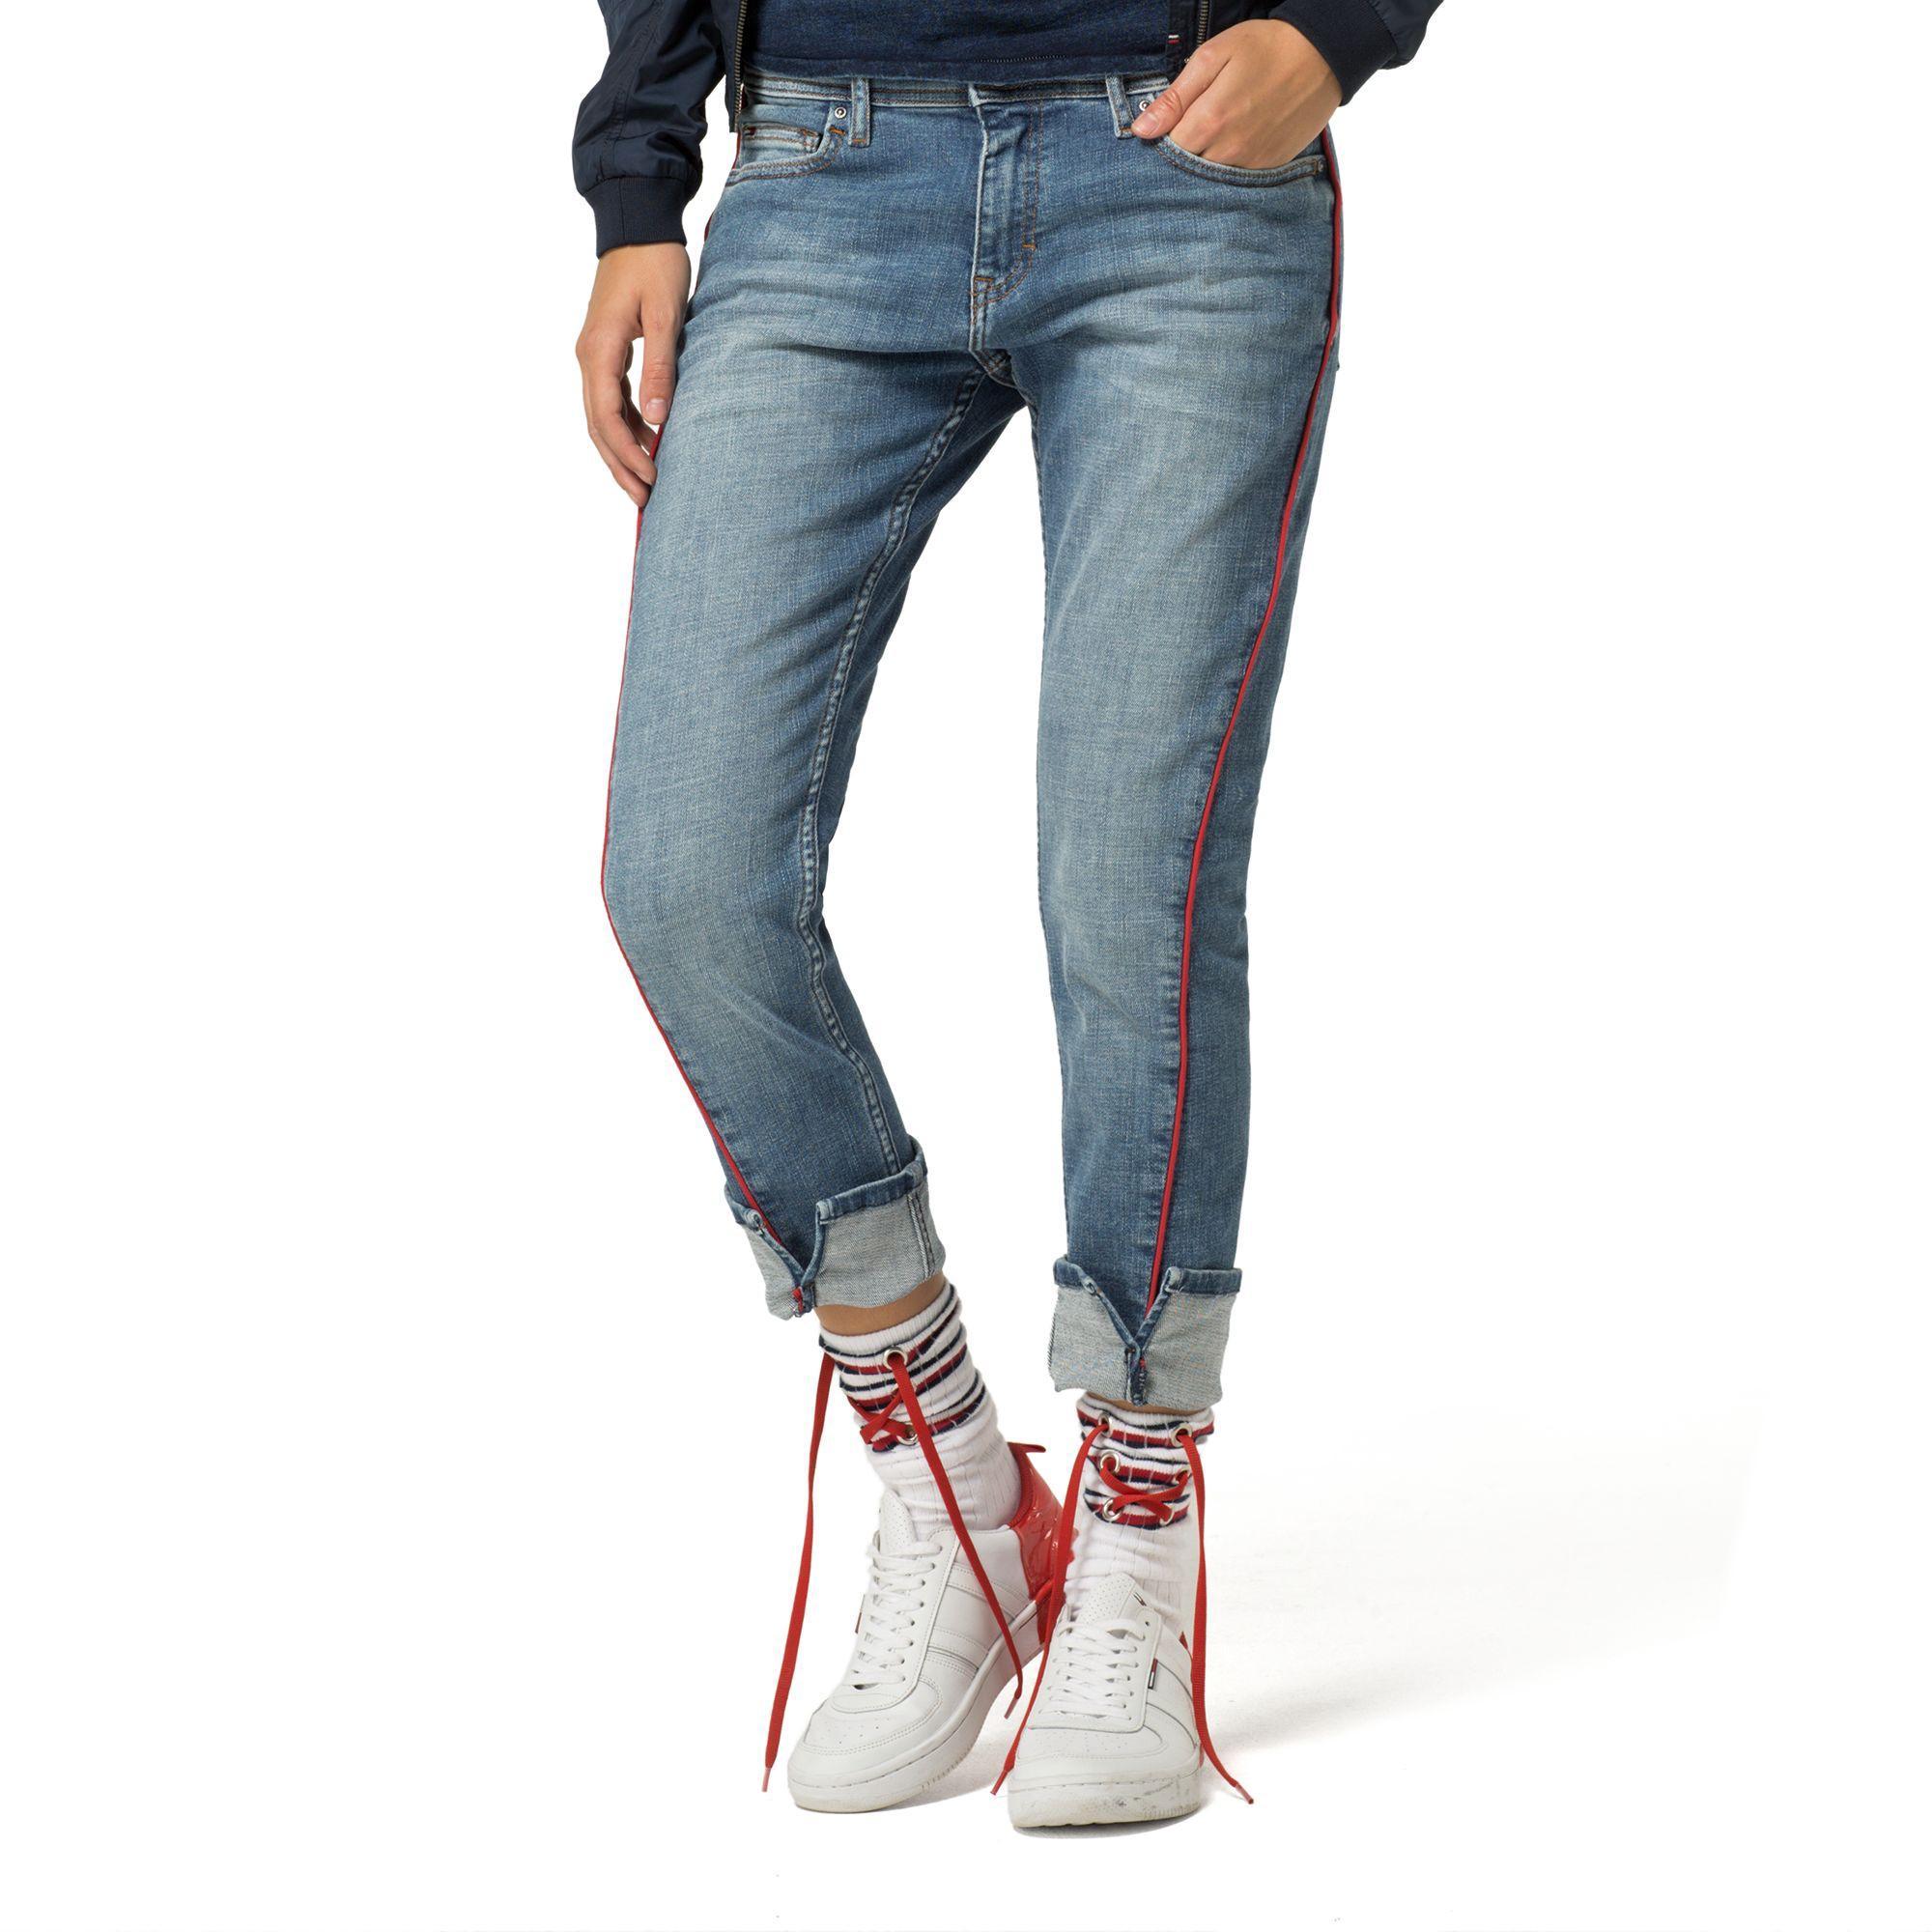 6d95170f8fce0 Tommy Hilfiger Twisted Straight Fit Jean - Cross Blue